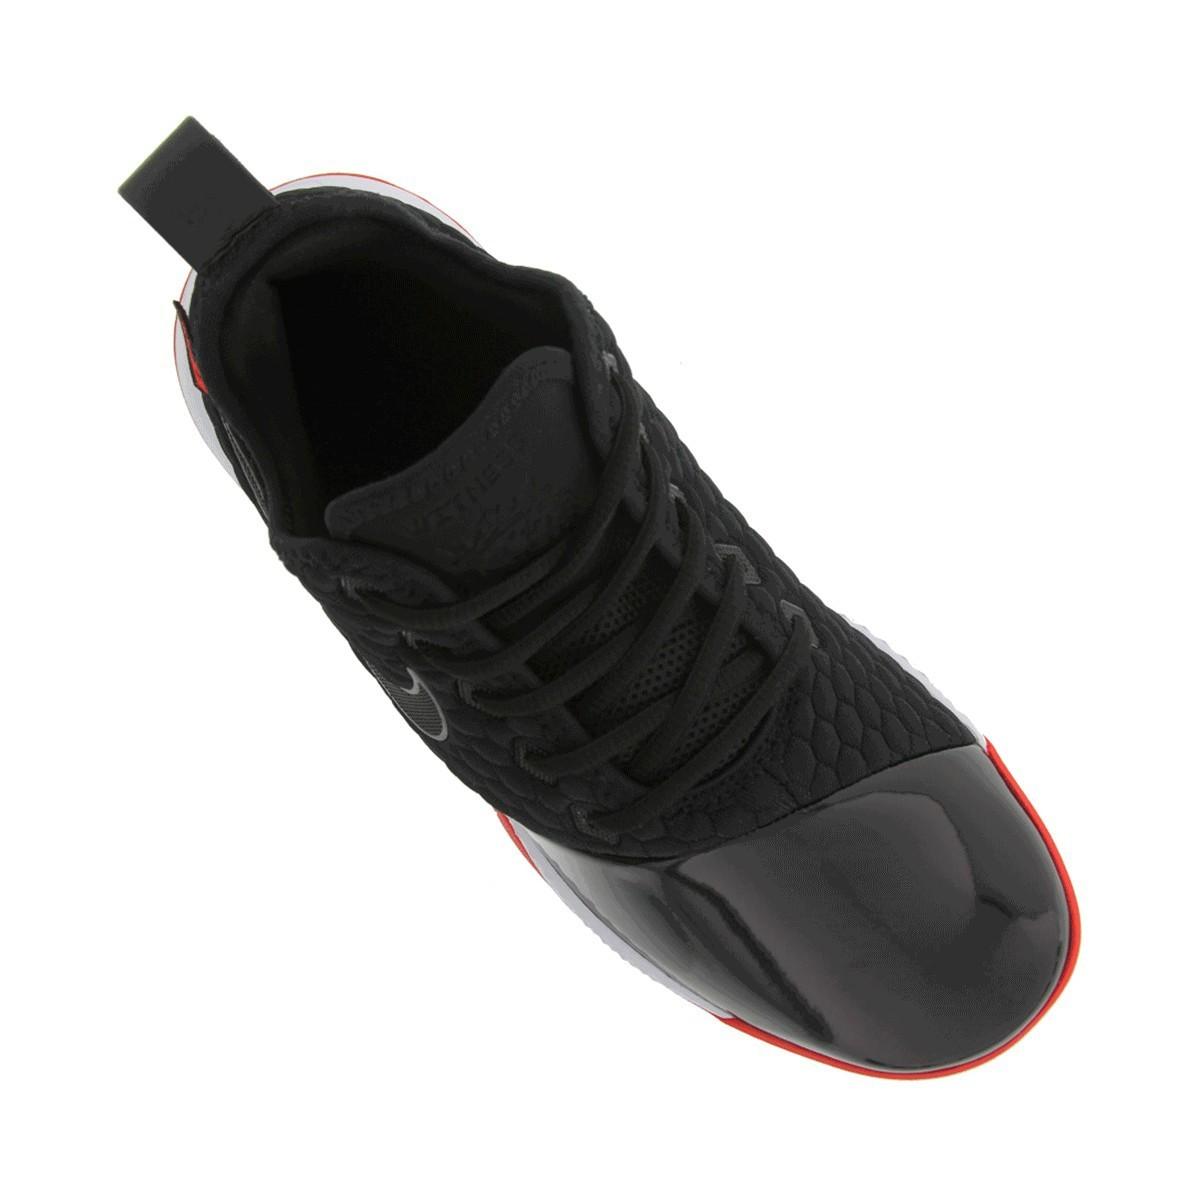 Tênis Nike Lebron Witness III Premium Preto Vermelho